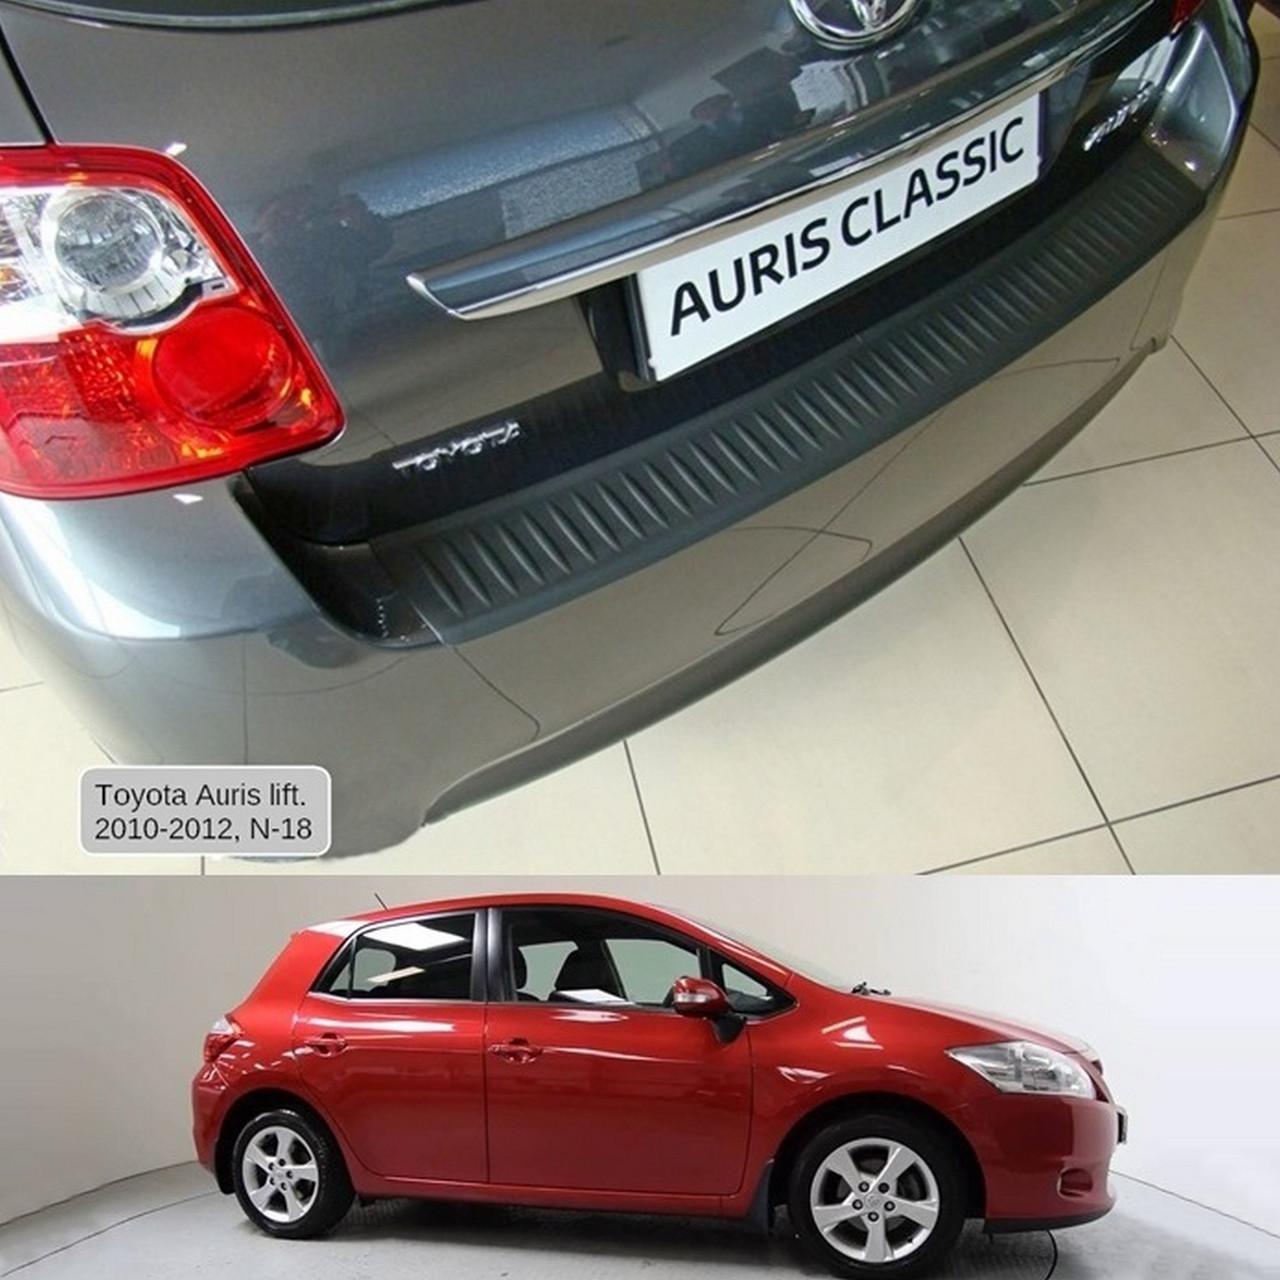 Пластикова захисна накладка на задній бампер для Toyota Auris 3/5dr. 2010-2012